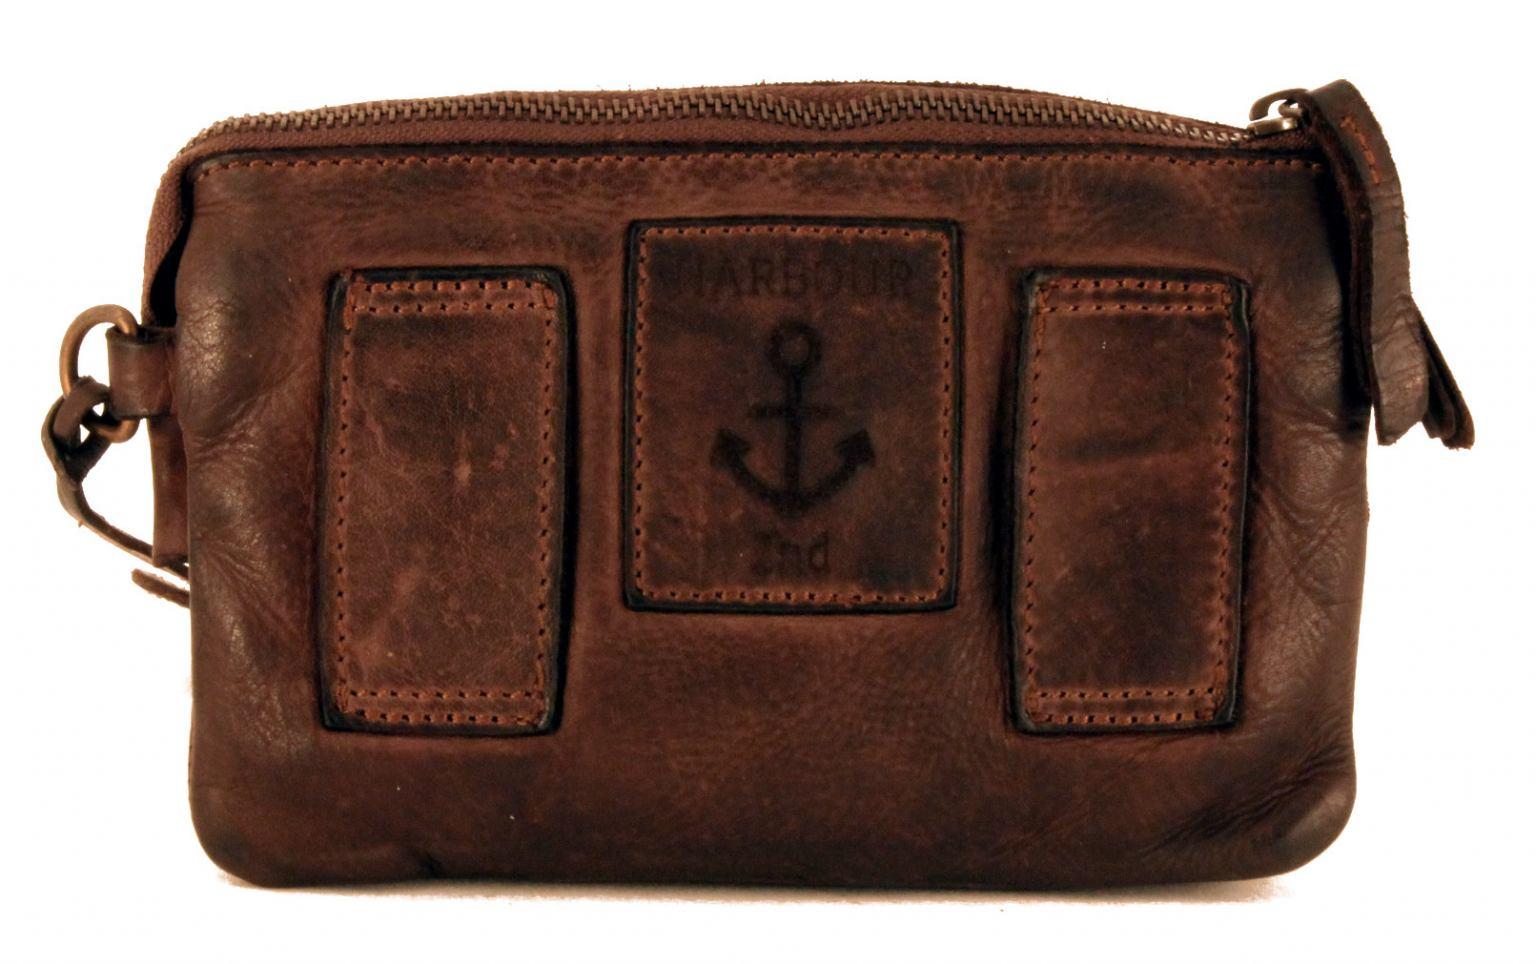 Harbour2nd Perla Hüfttasche graubraun Stone Grey Vintage Leder